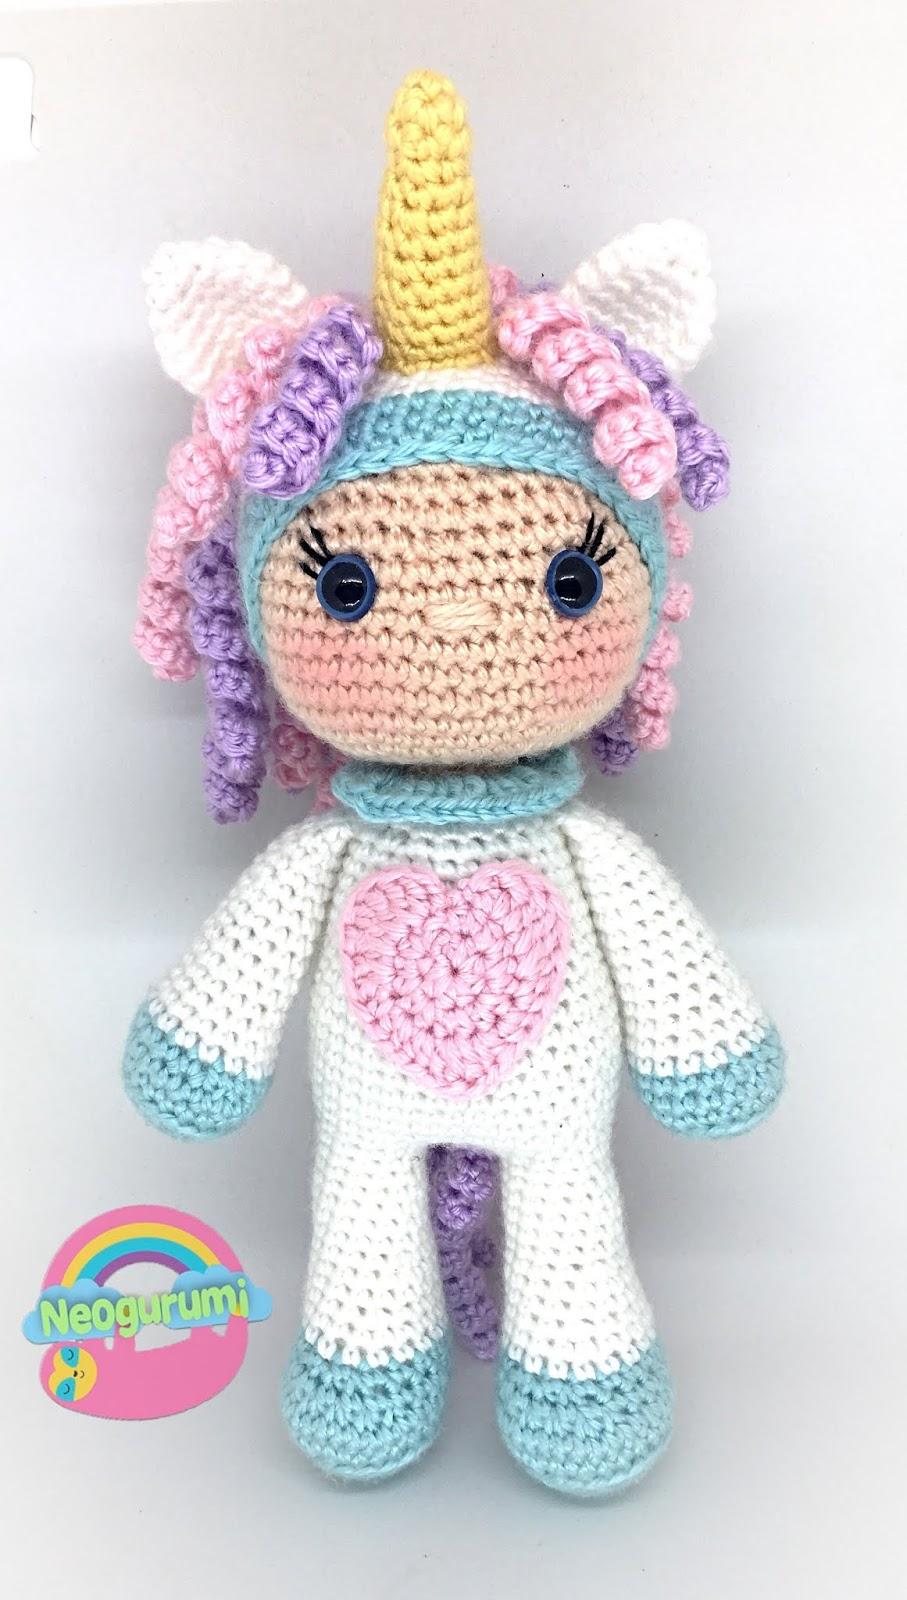 cozy-neogurumi-amigurumi-chloe-doll-cal-free-pattern-10 Amigurumi Chloe Doll Cal Ücretsiz Desen